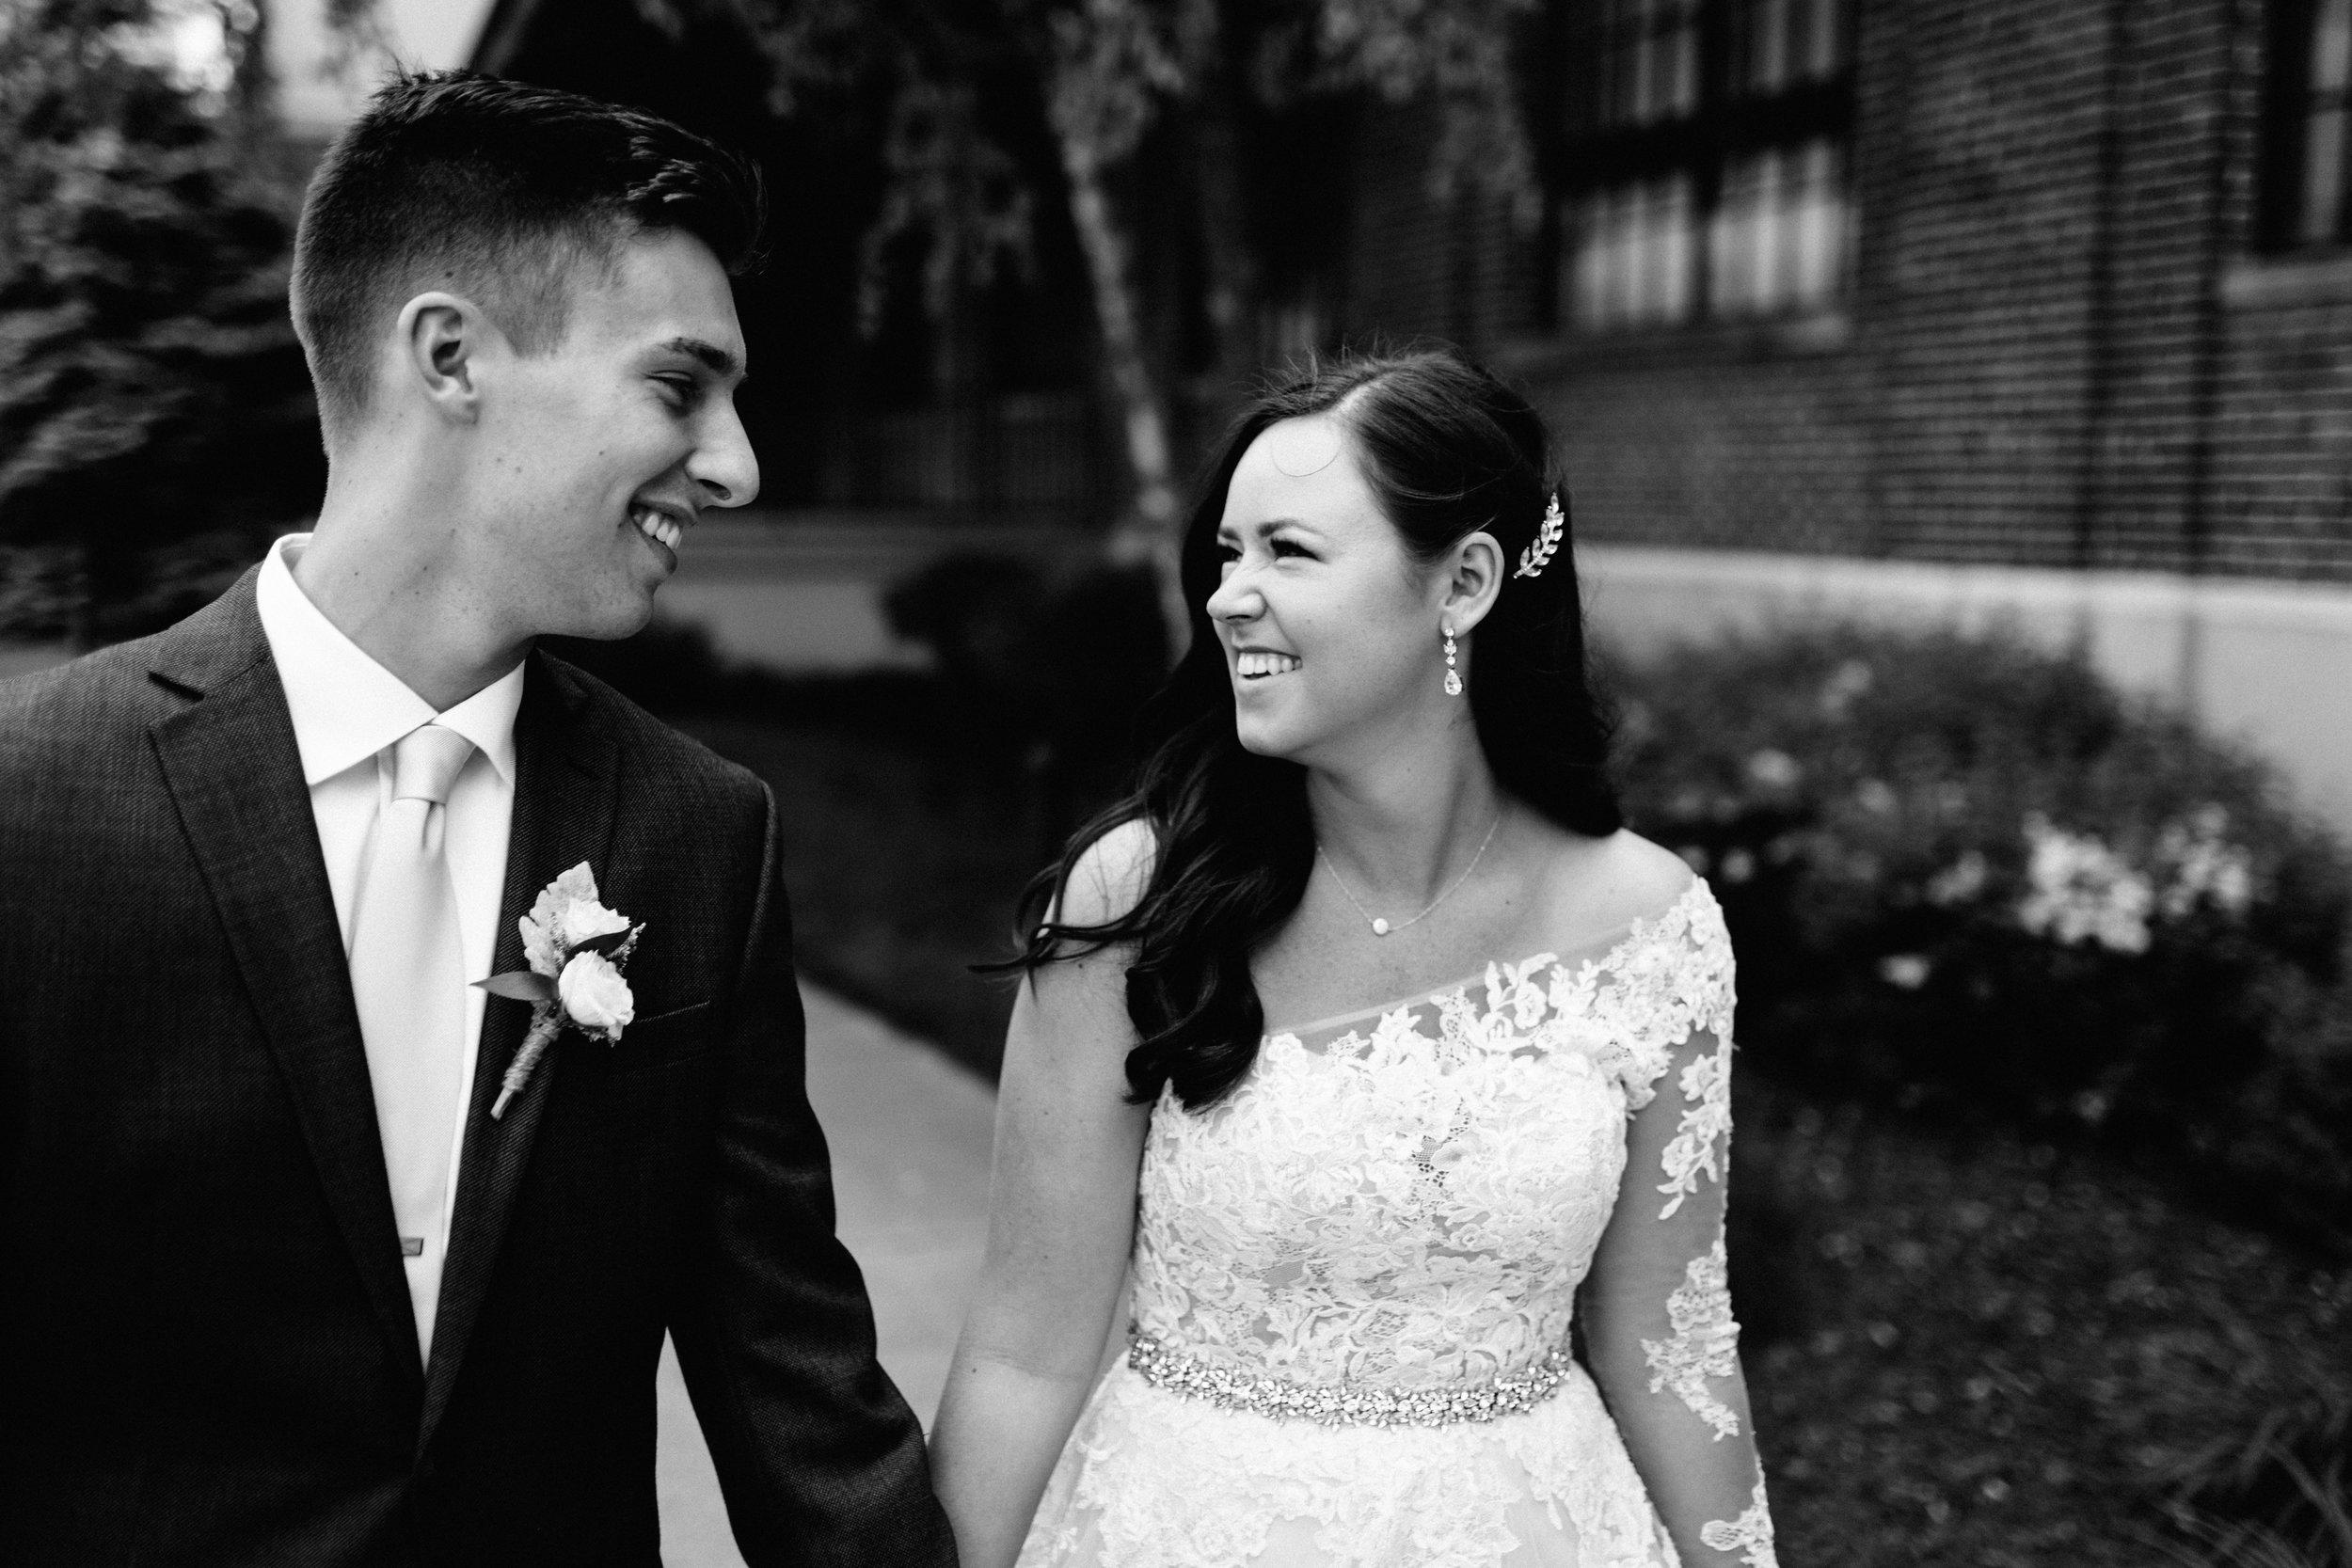 GRAYCENTOMHAMILTON-GRAND-RAPIDS-WEDDING-PHOTOGRAPHY-38.jpg